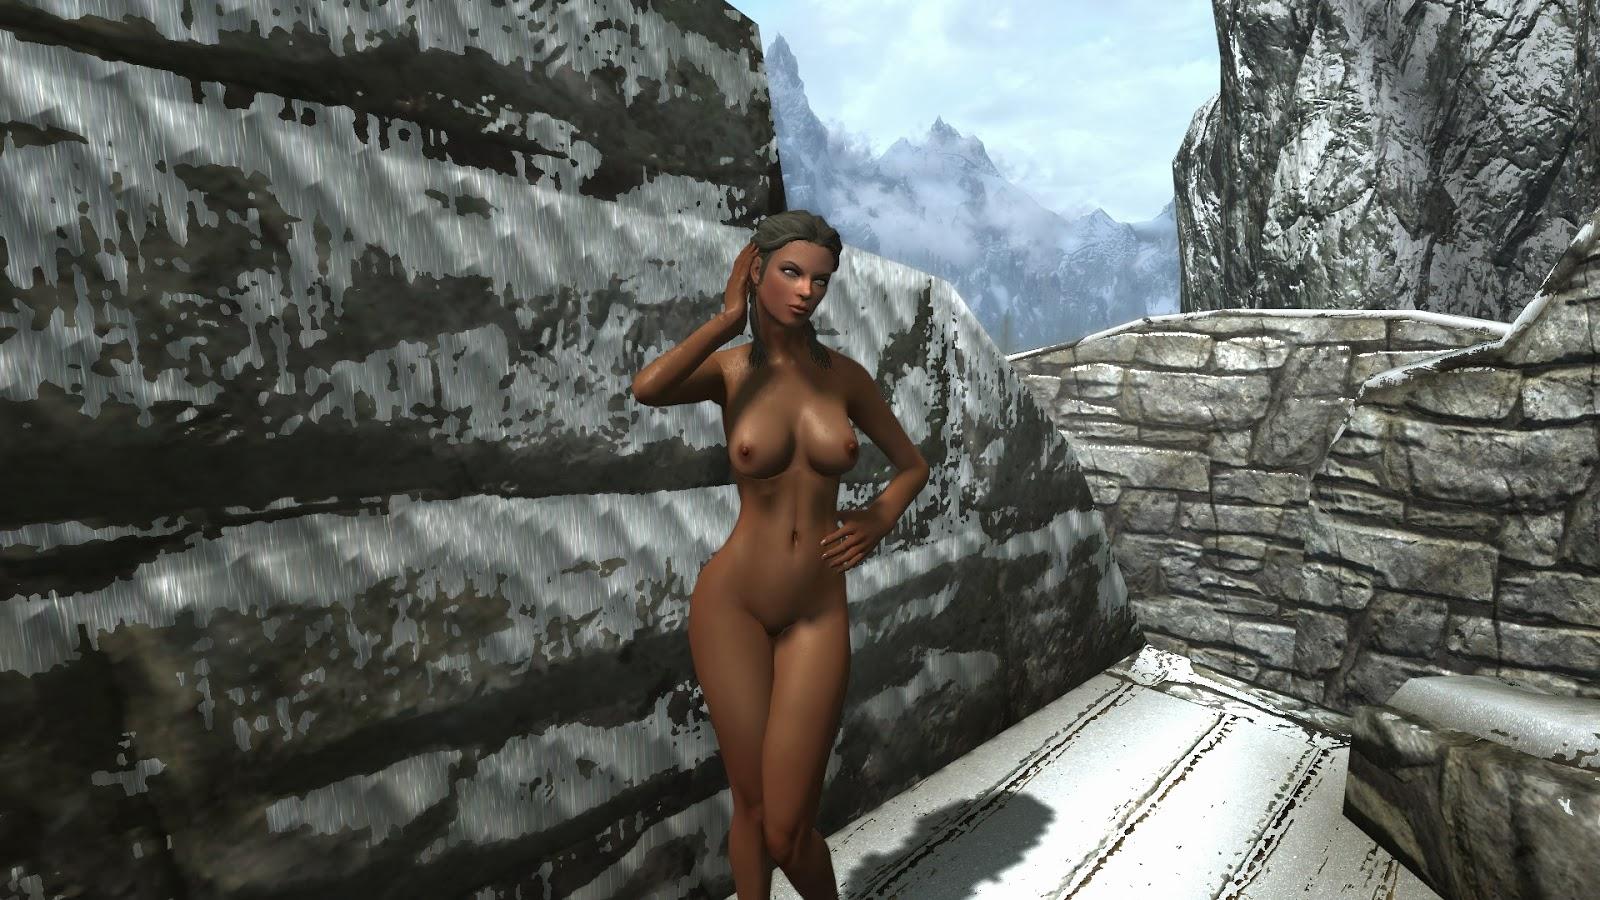 Skyrim nude mod nudemod net naked image